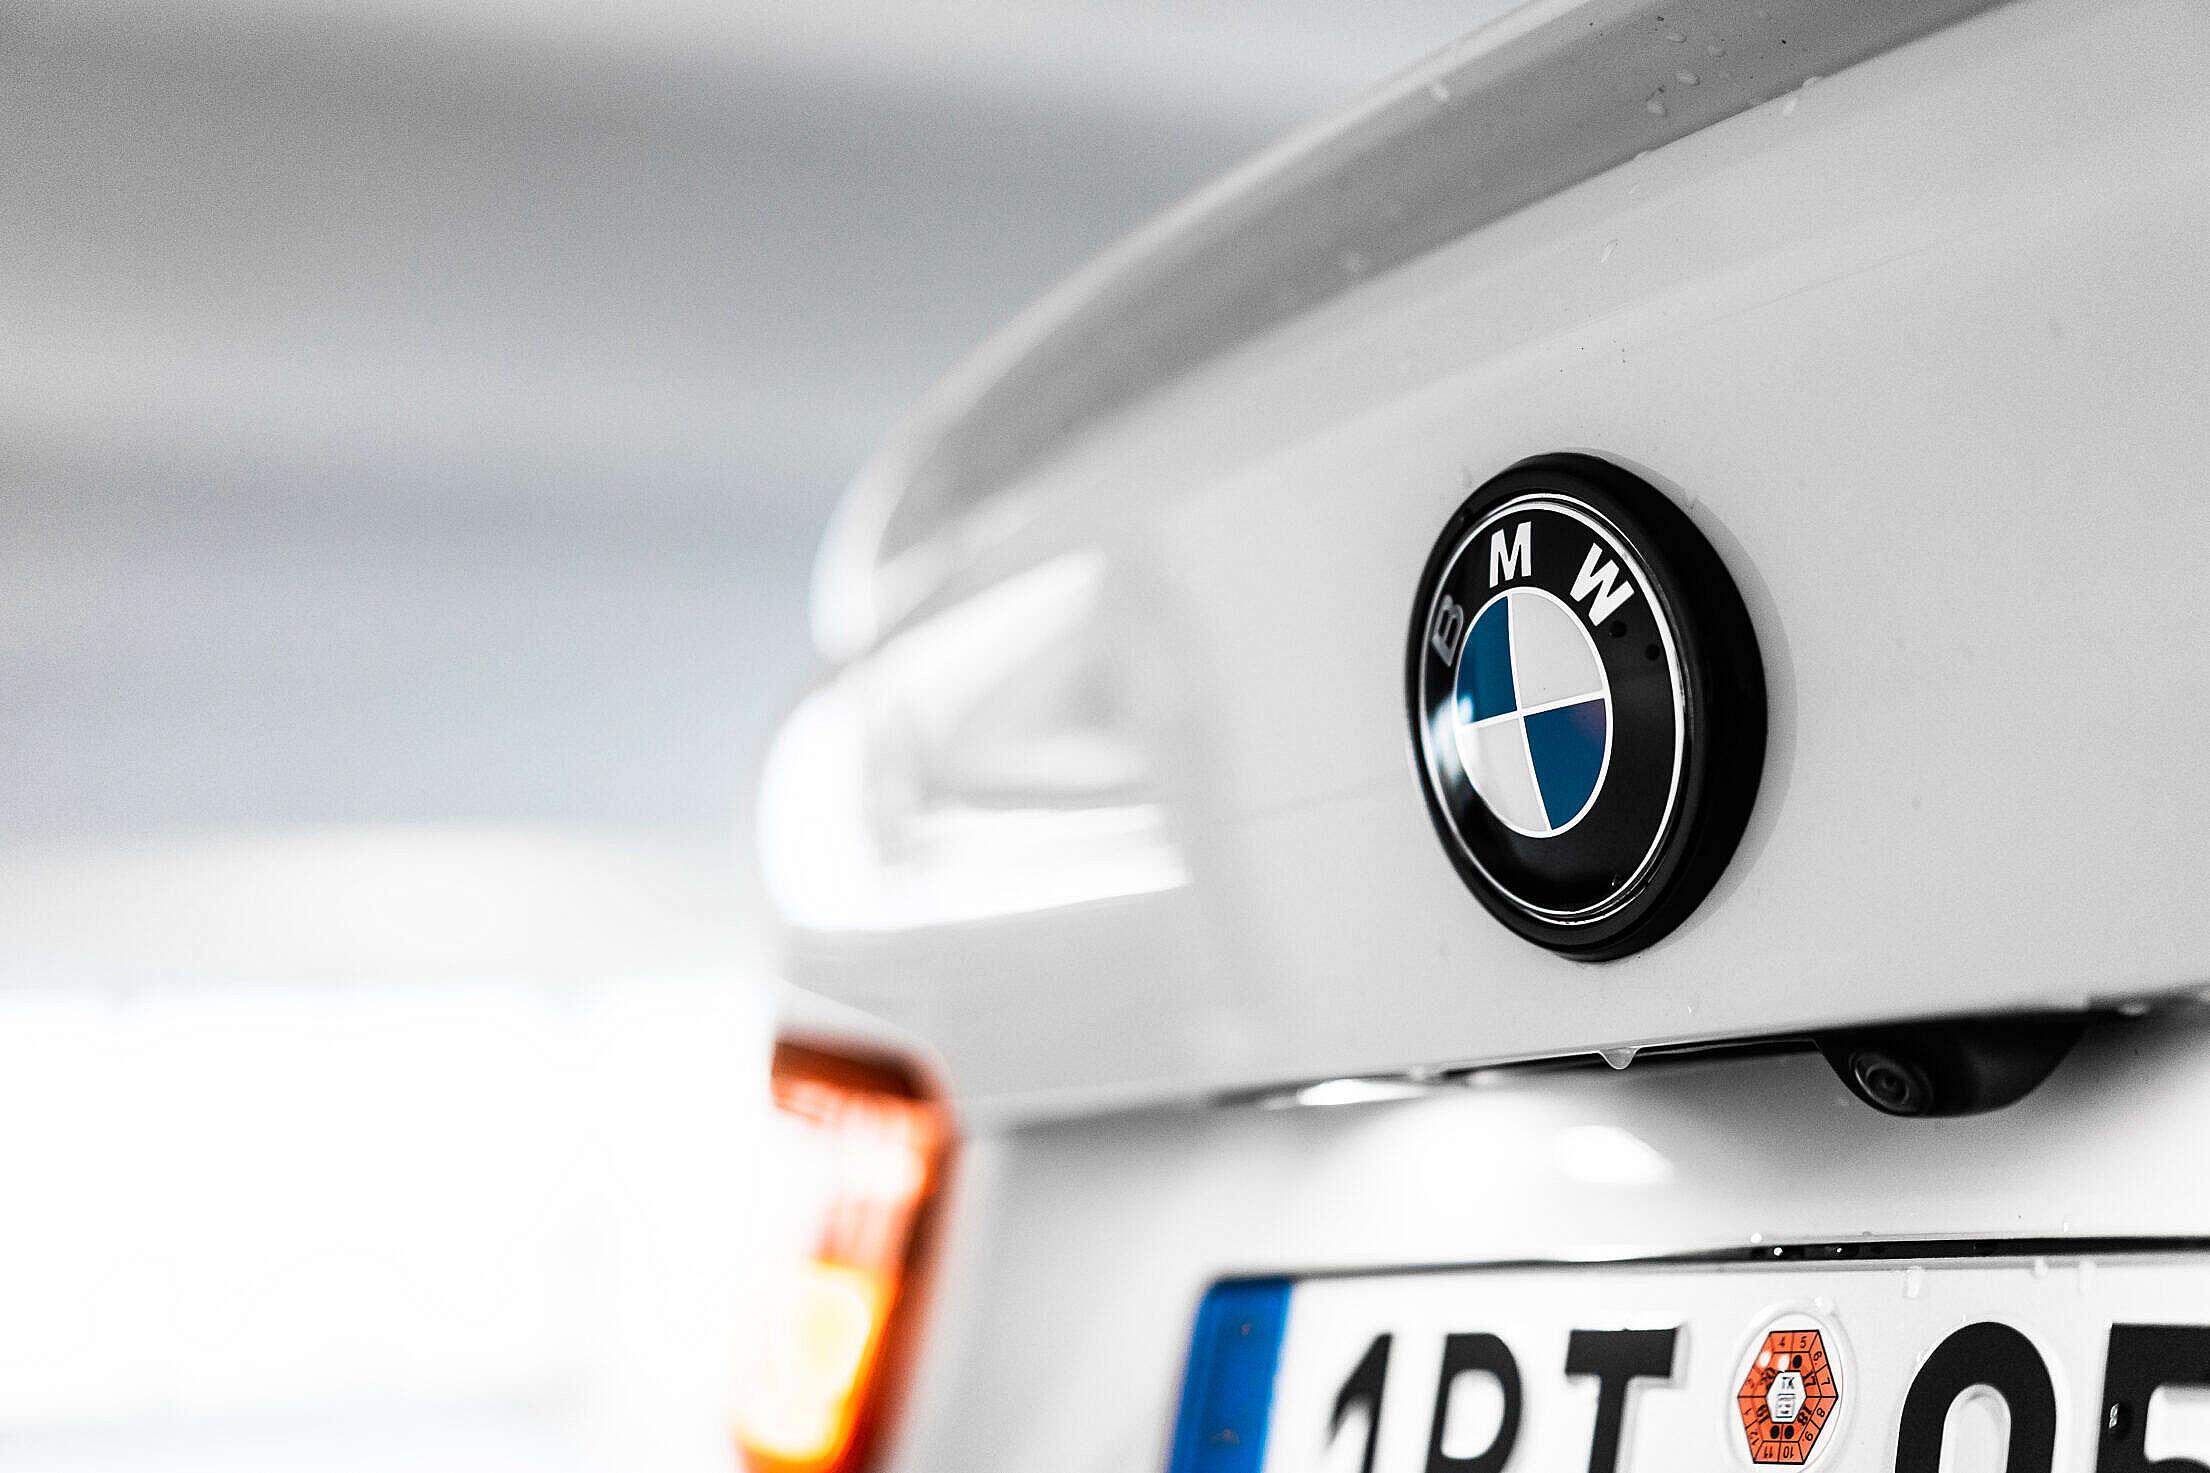 BMW Logo Emblem on Trunk Free Stock Photo